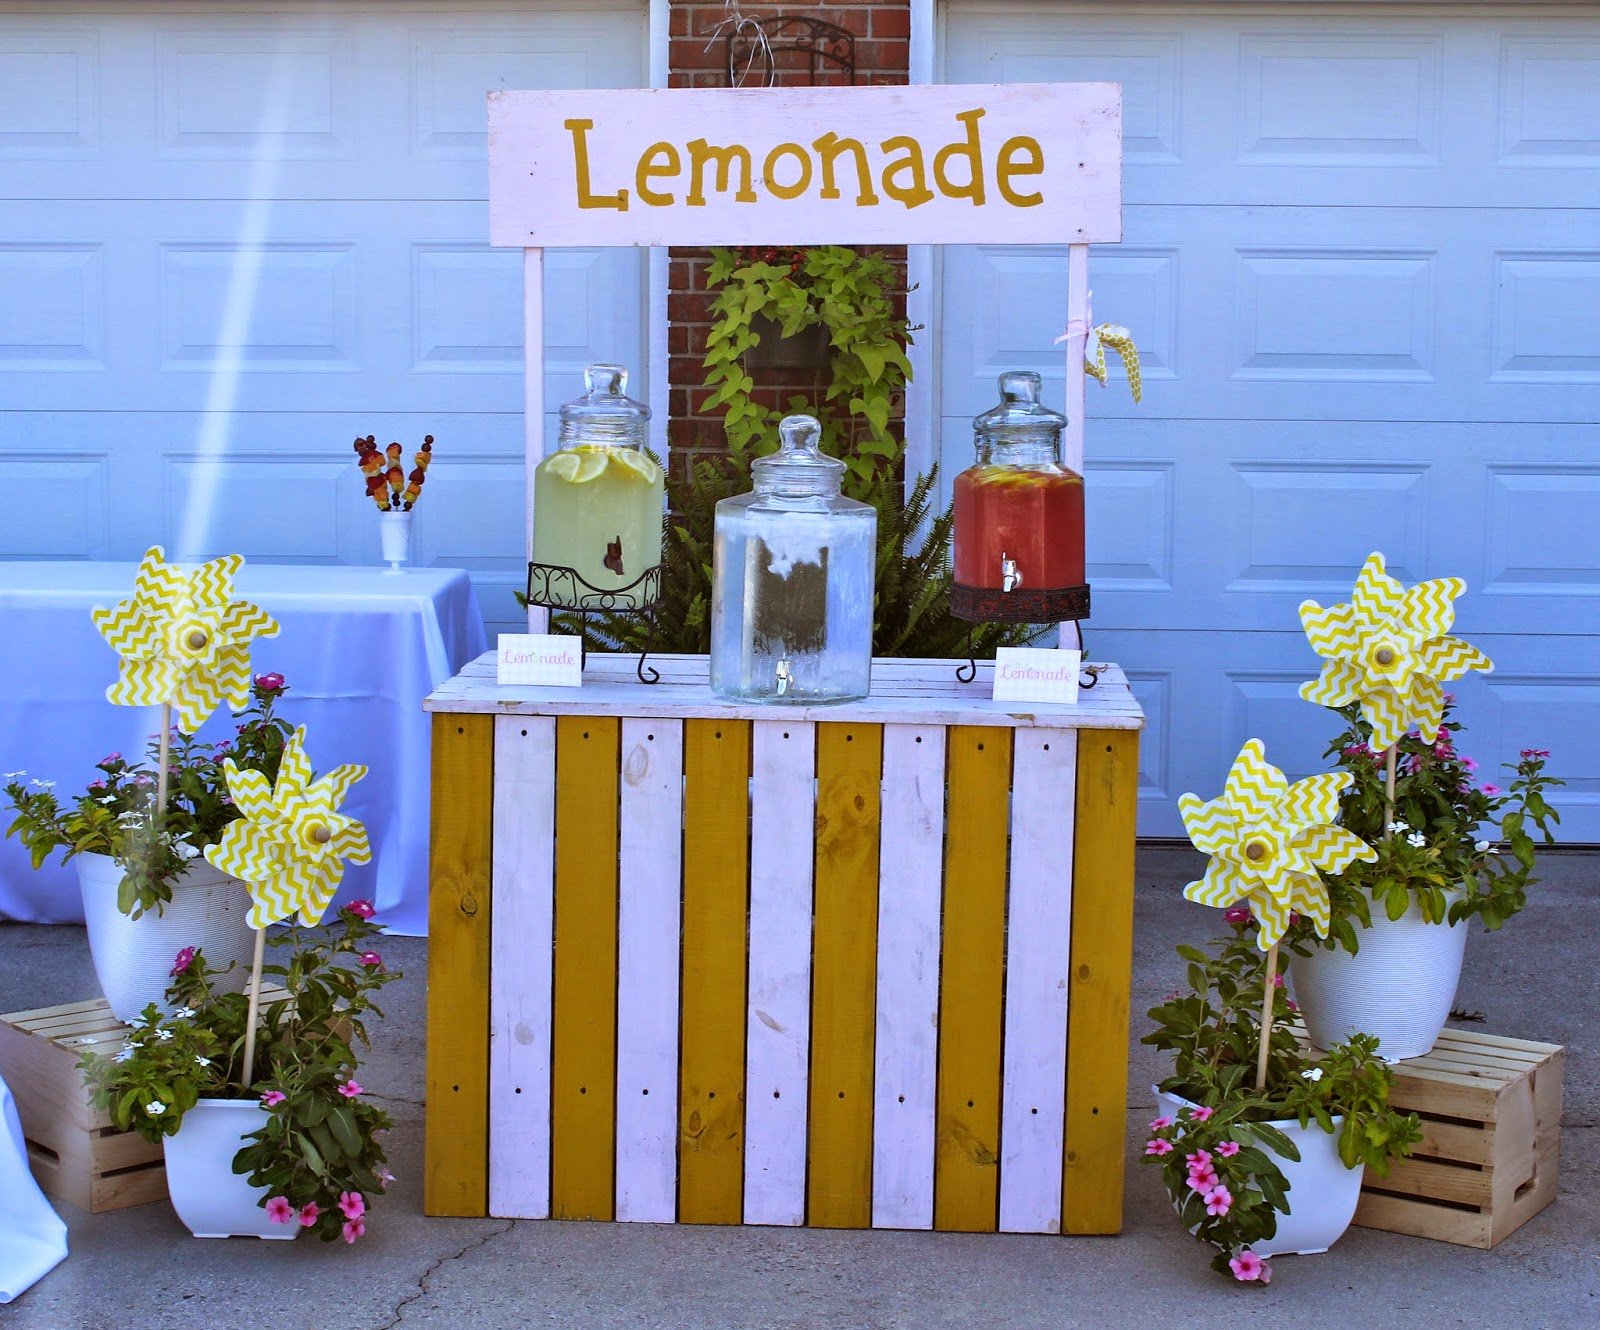 Lemonade Day Reflection